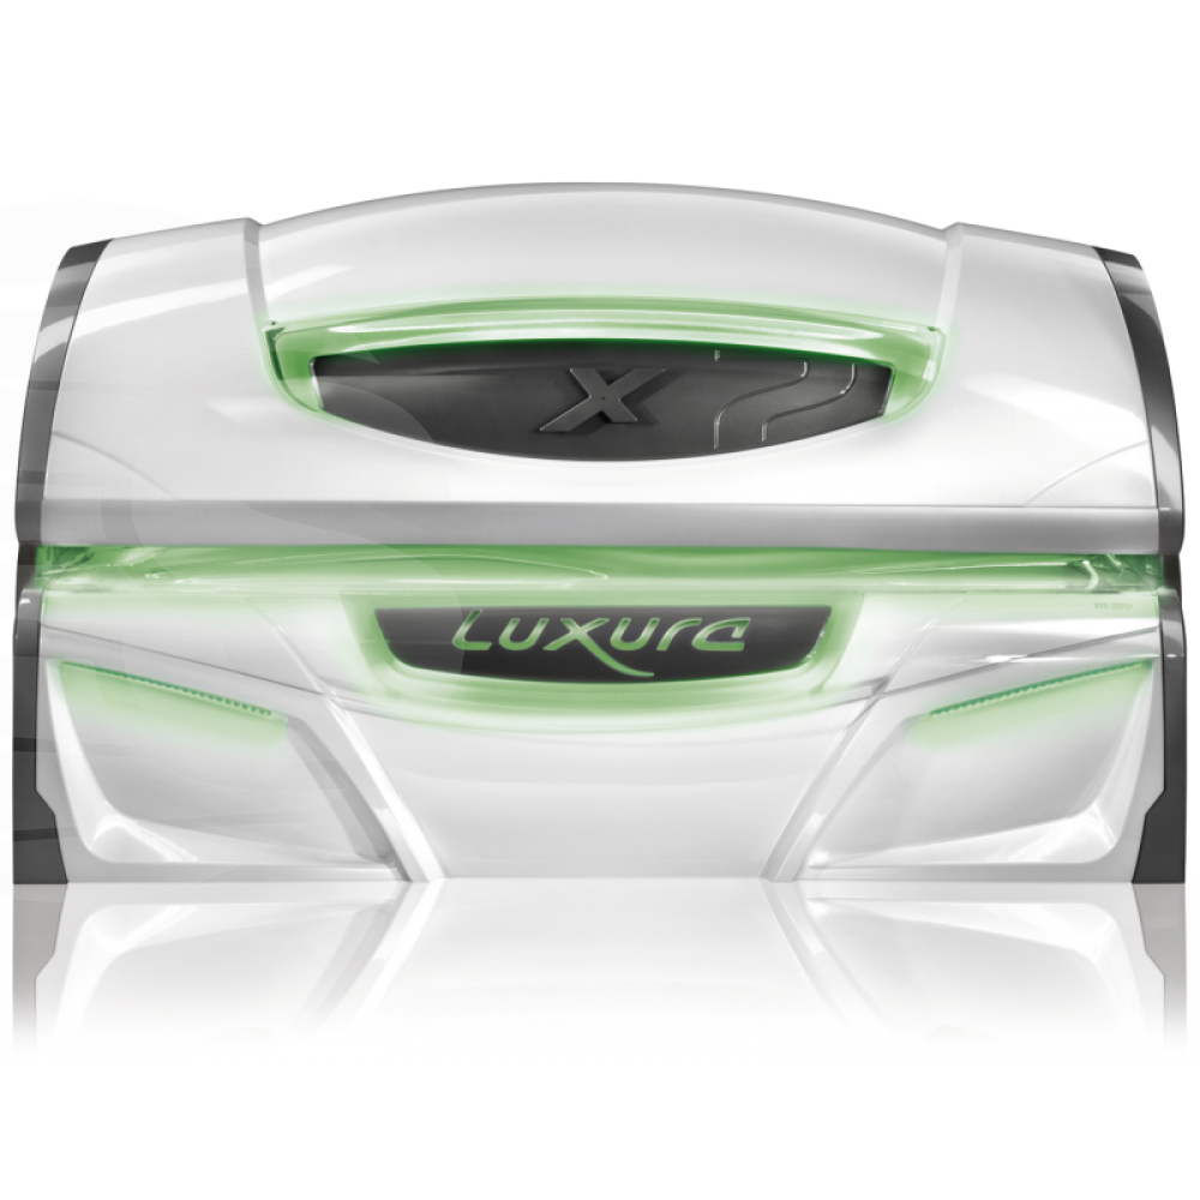 Hapro Luxura X7 38 SLI